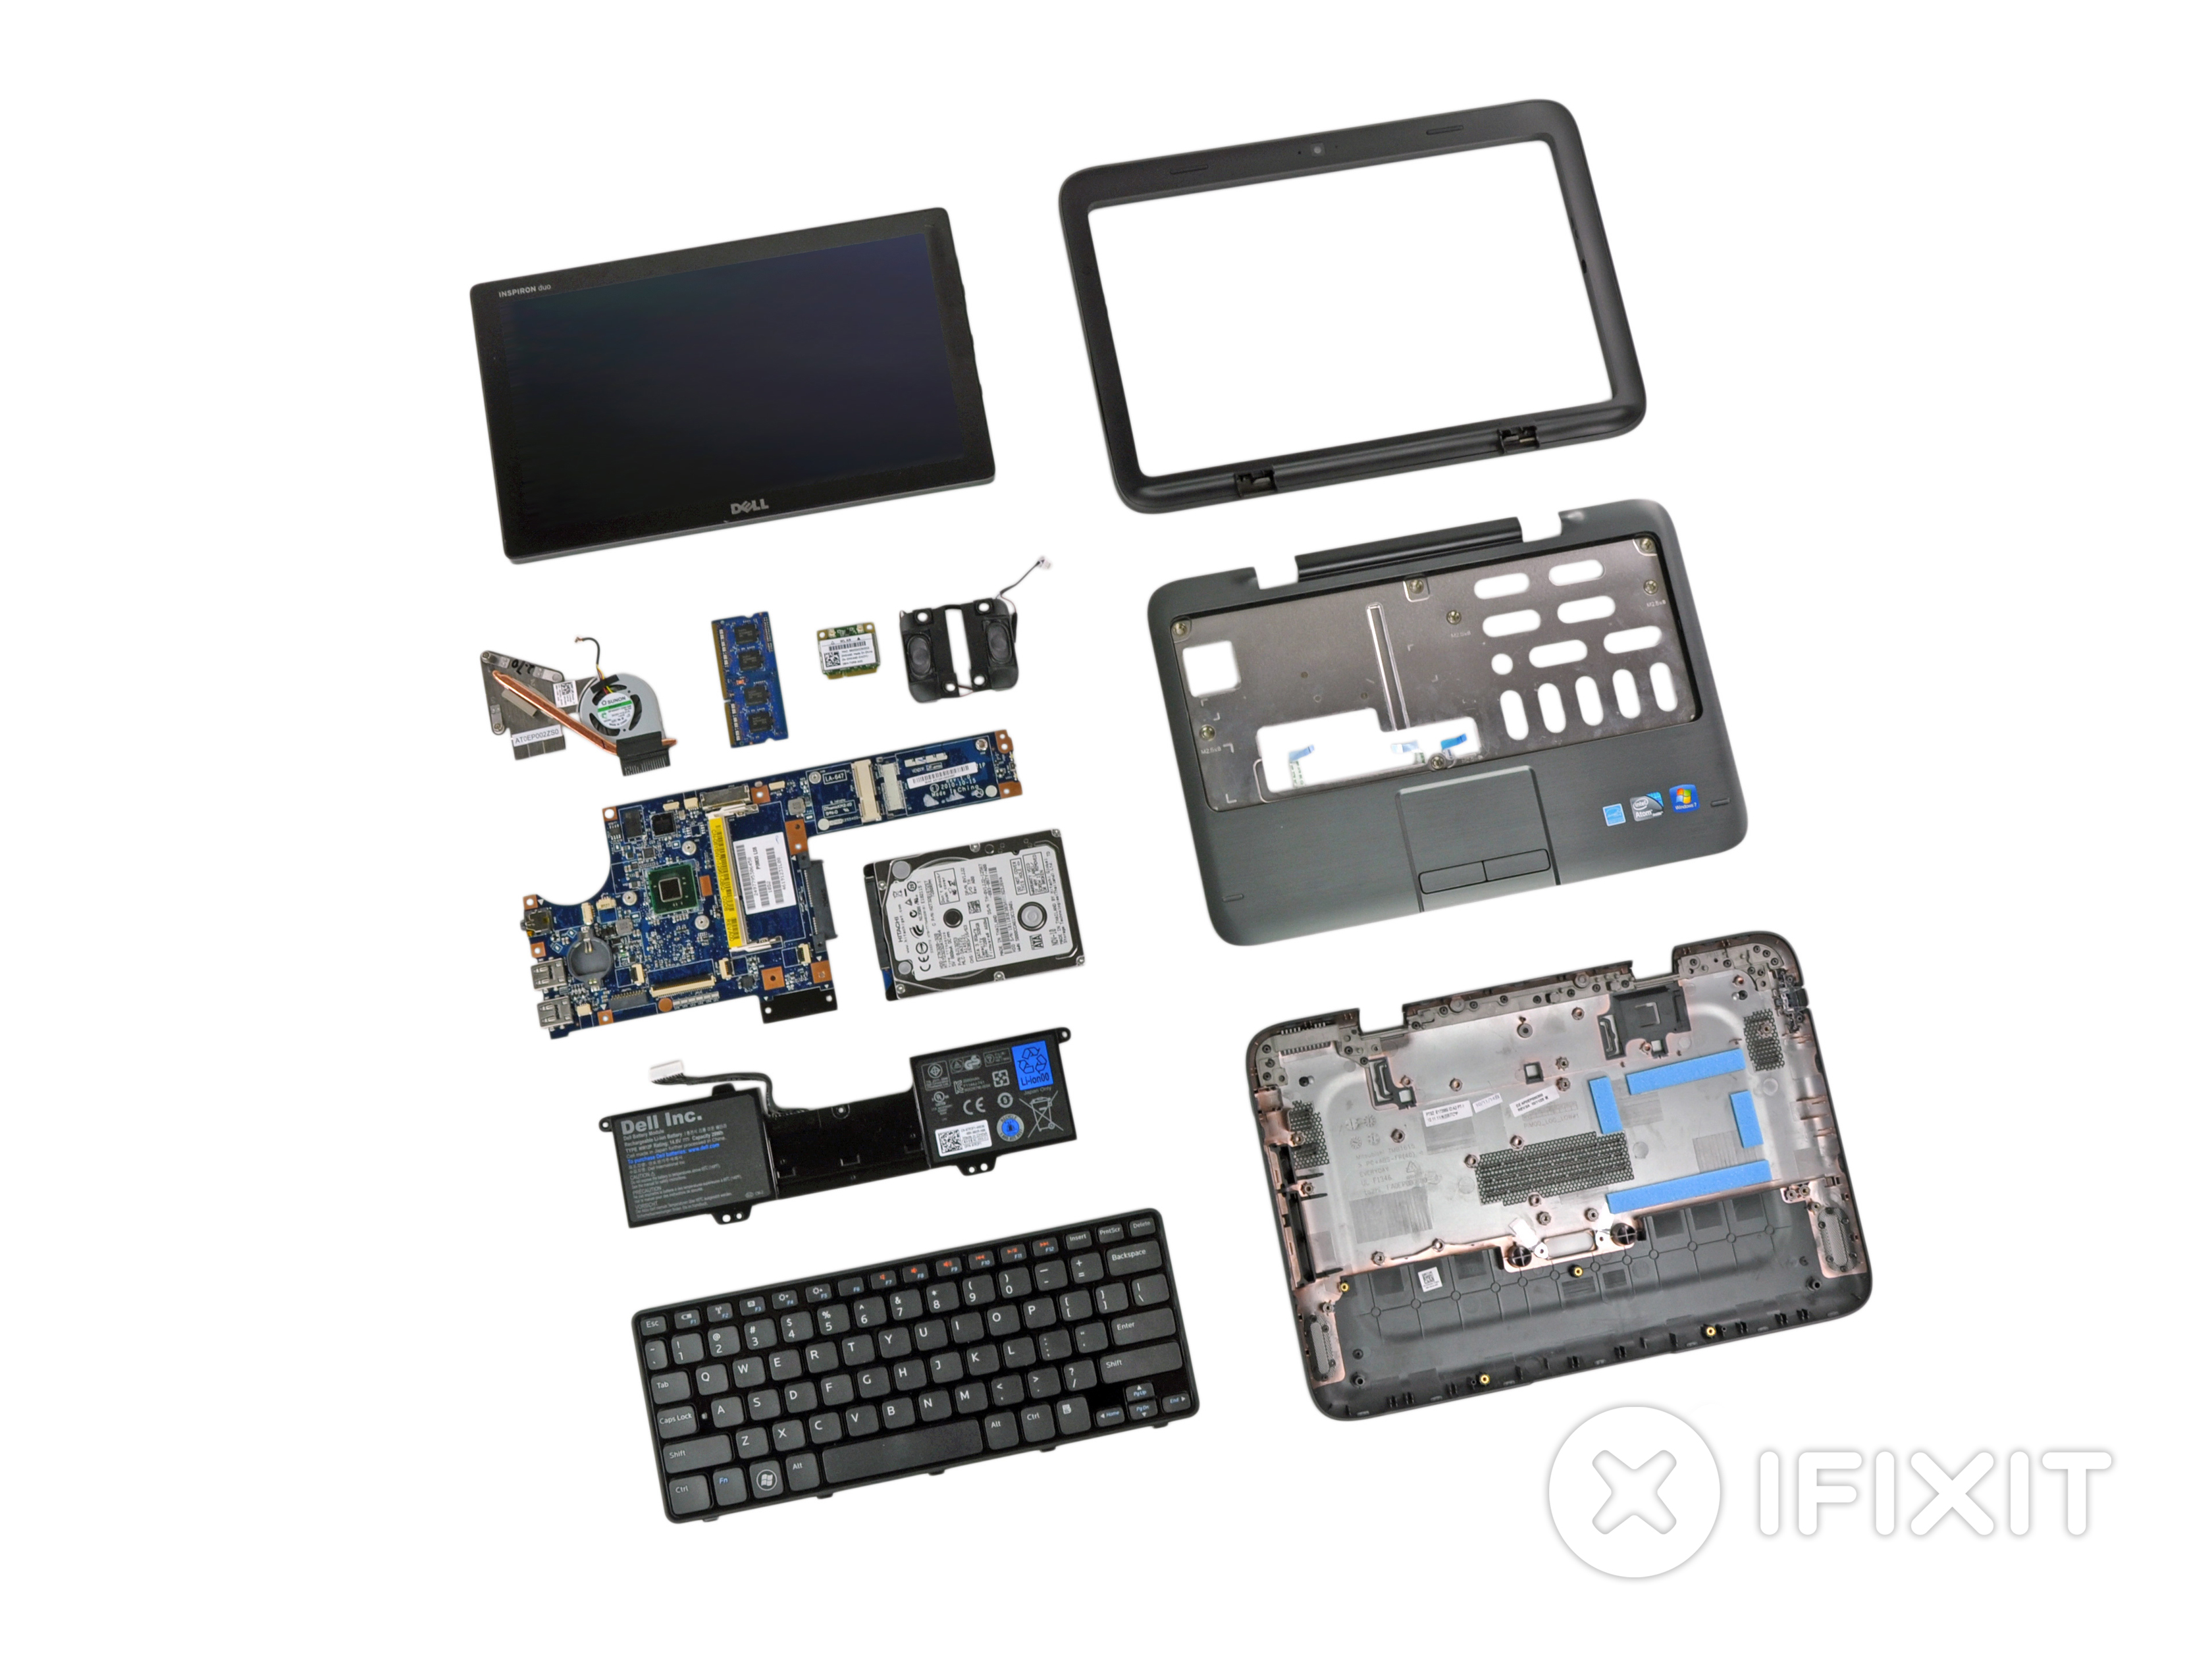 Dell Inspiron Duo Repair - iFixit